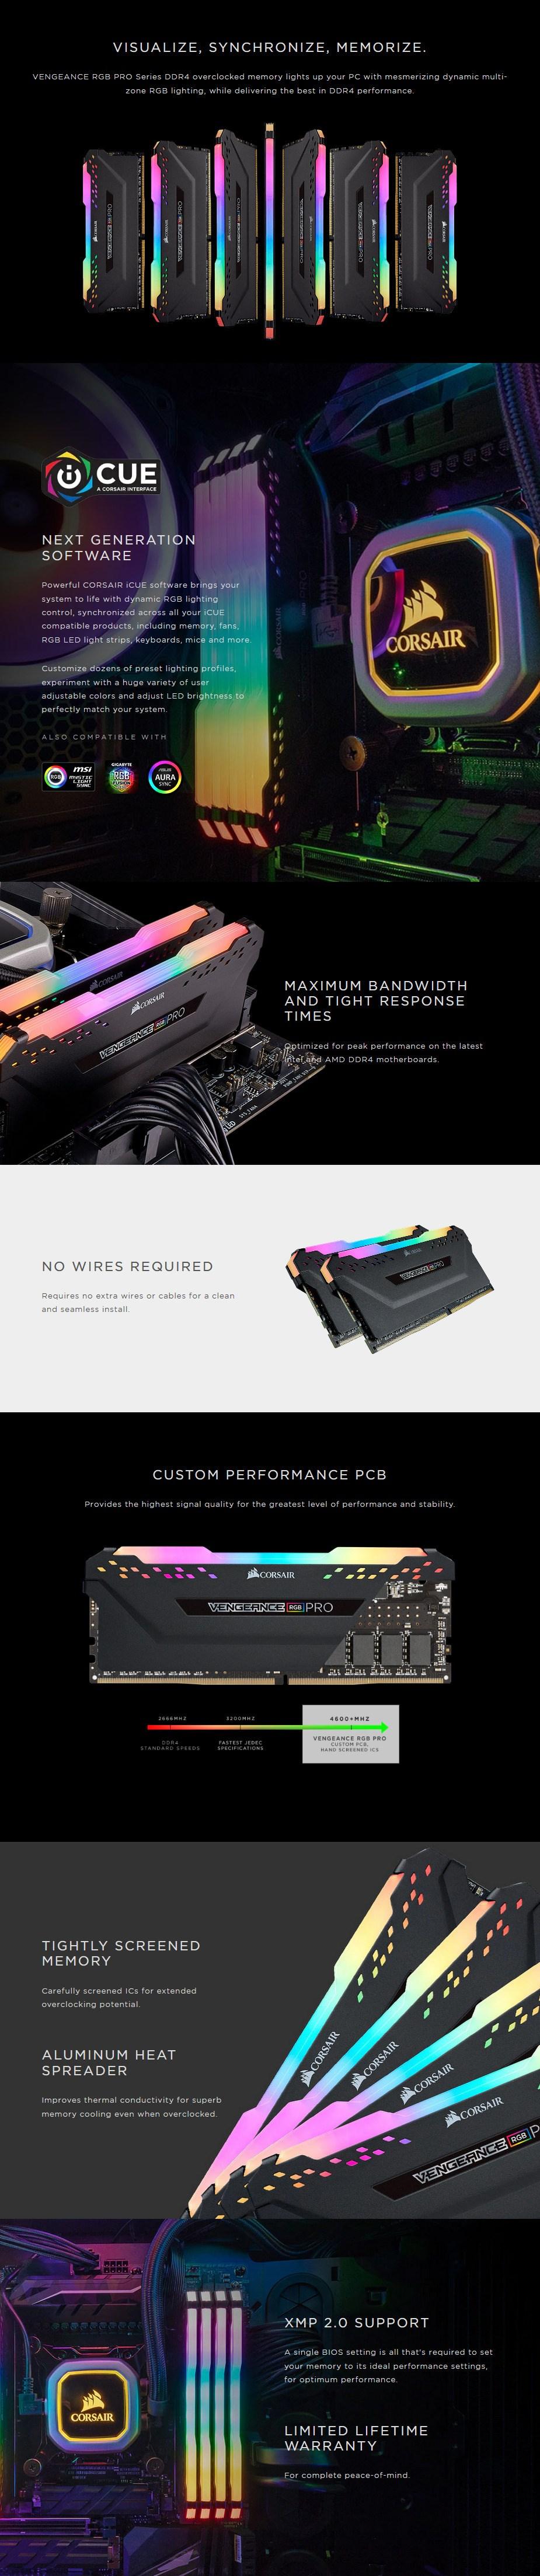 Corsair Vengeance RGB PRO 64GB (2x 32GB) DDR4 3200MHz Memory - Black - Overview 1